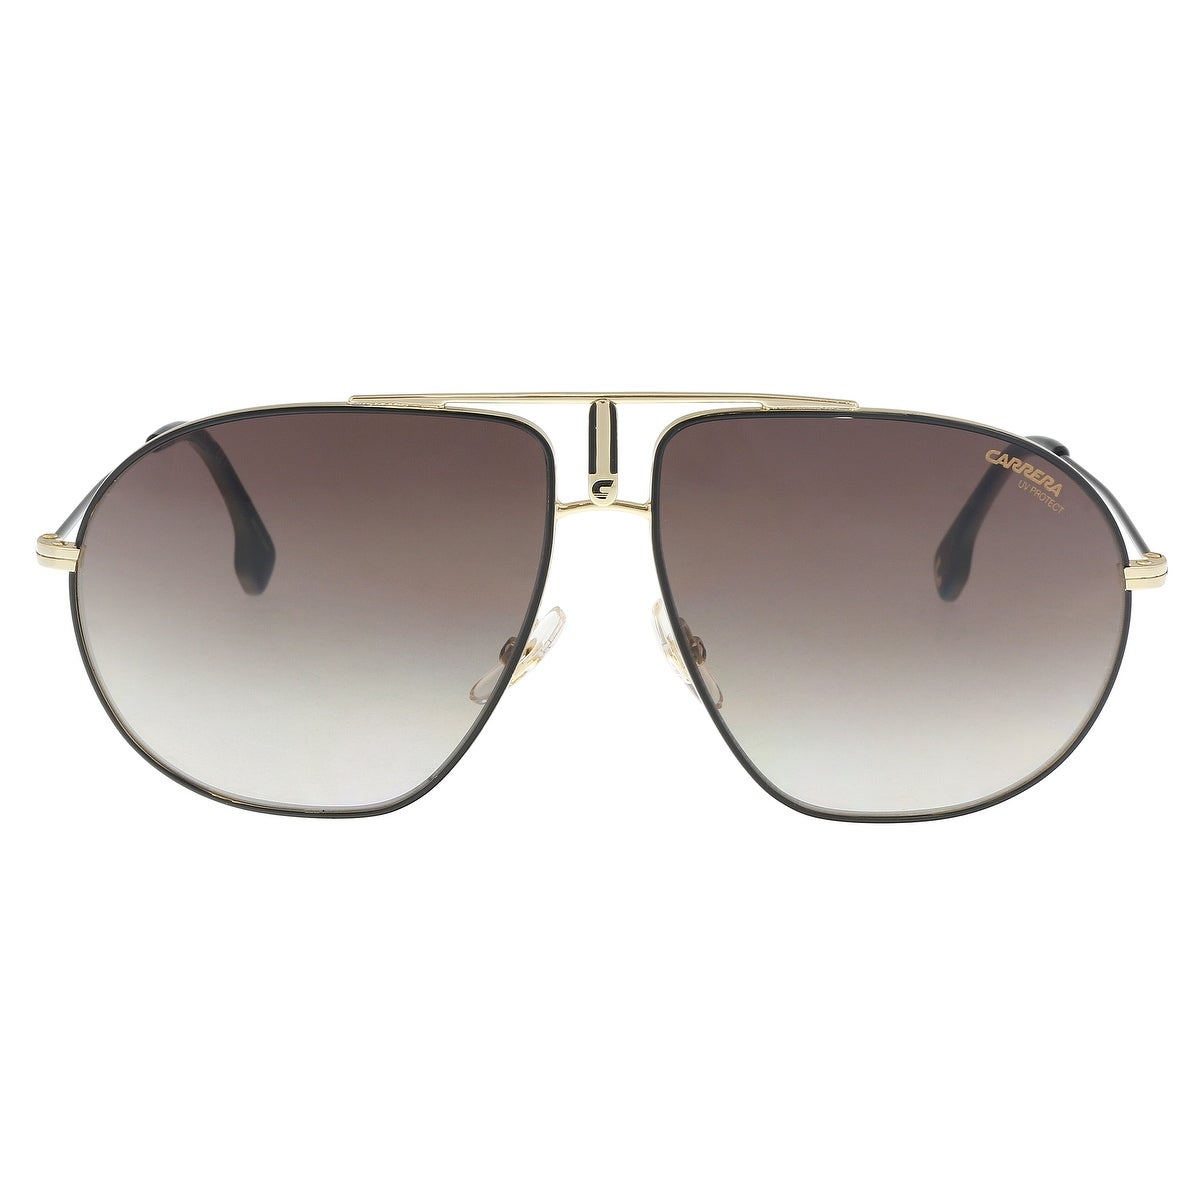 1fd07a8b675 Shop Carrera BOUND 02M2-HA Black Gold Aviator Sunglasses - 60-12-145 - Free  Shipping Today - Overstock - 21449703